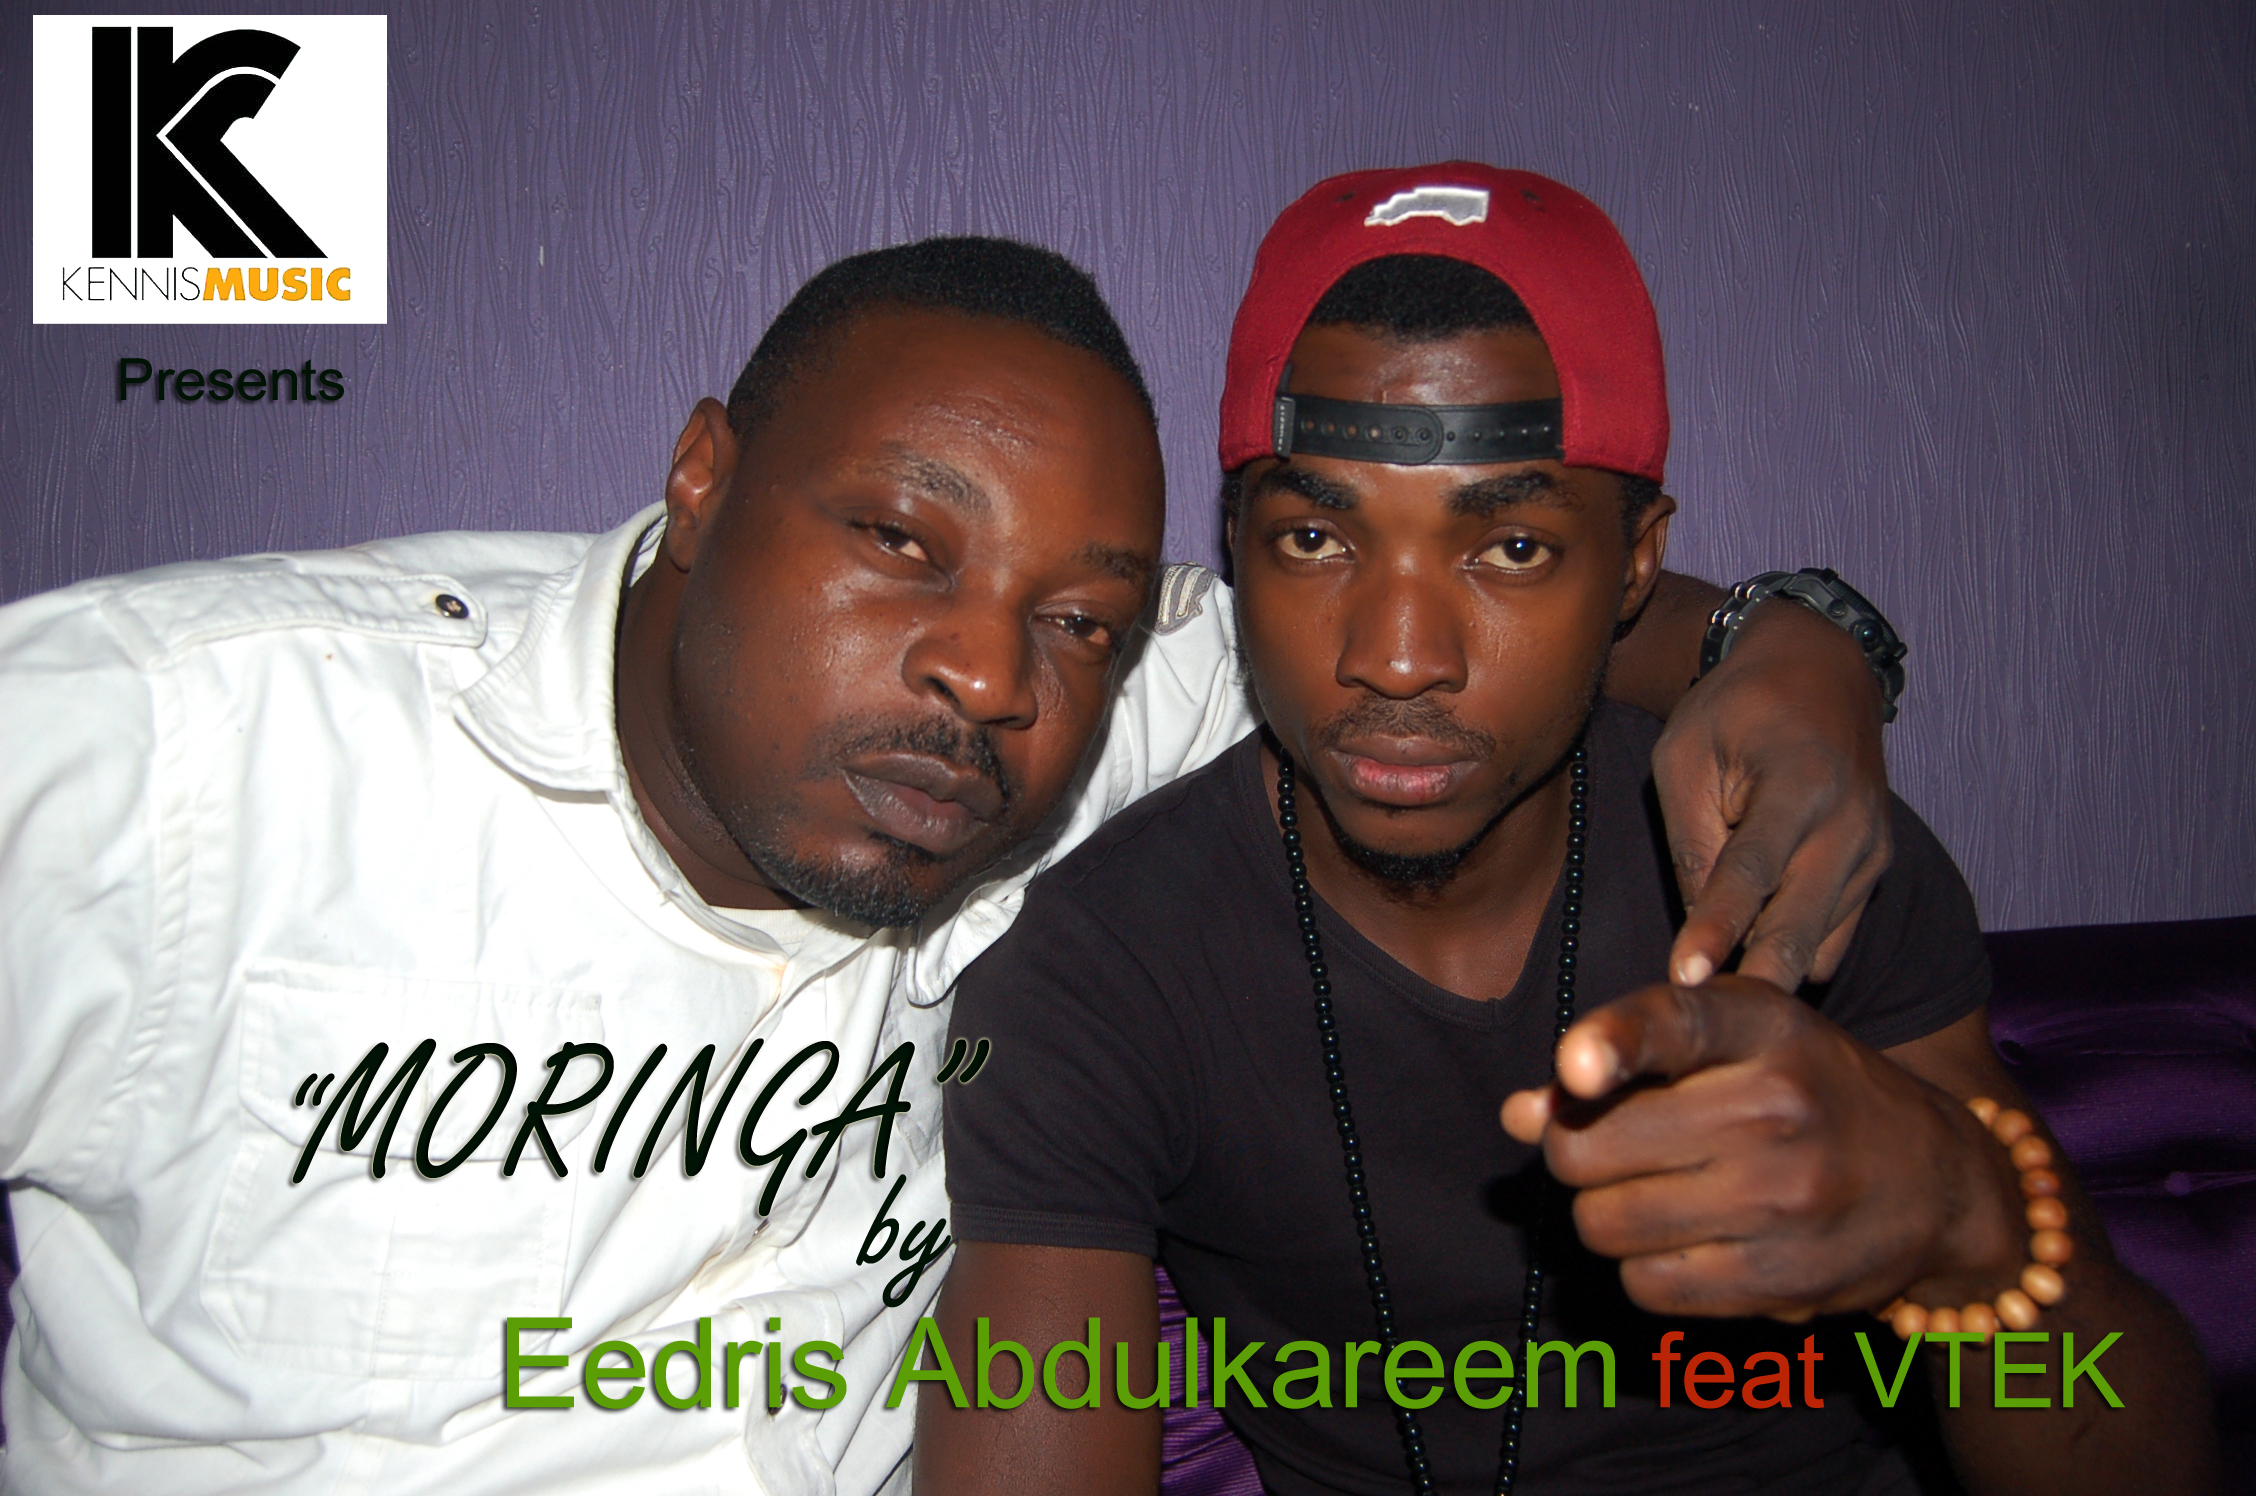 Eedris Abdulkareem Feat VTEK produced by VTEK